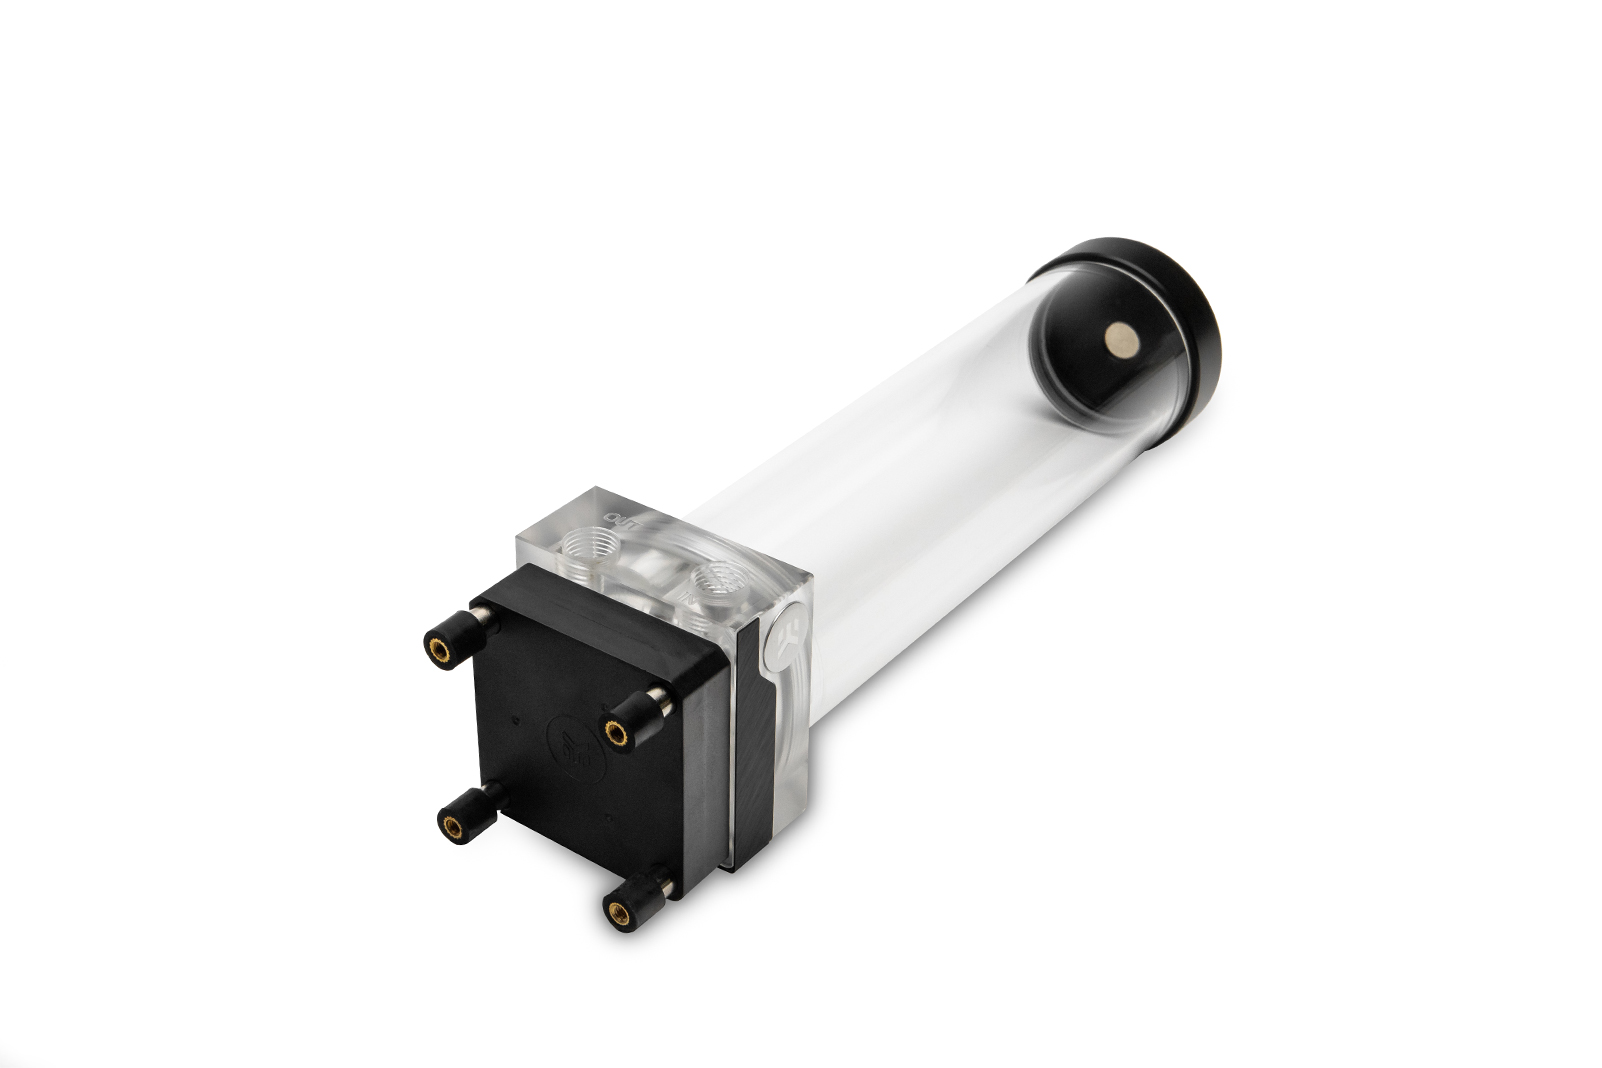 EK Classic pump-reservoir RGB PWM